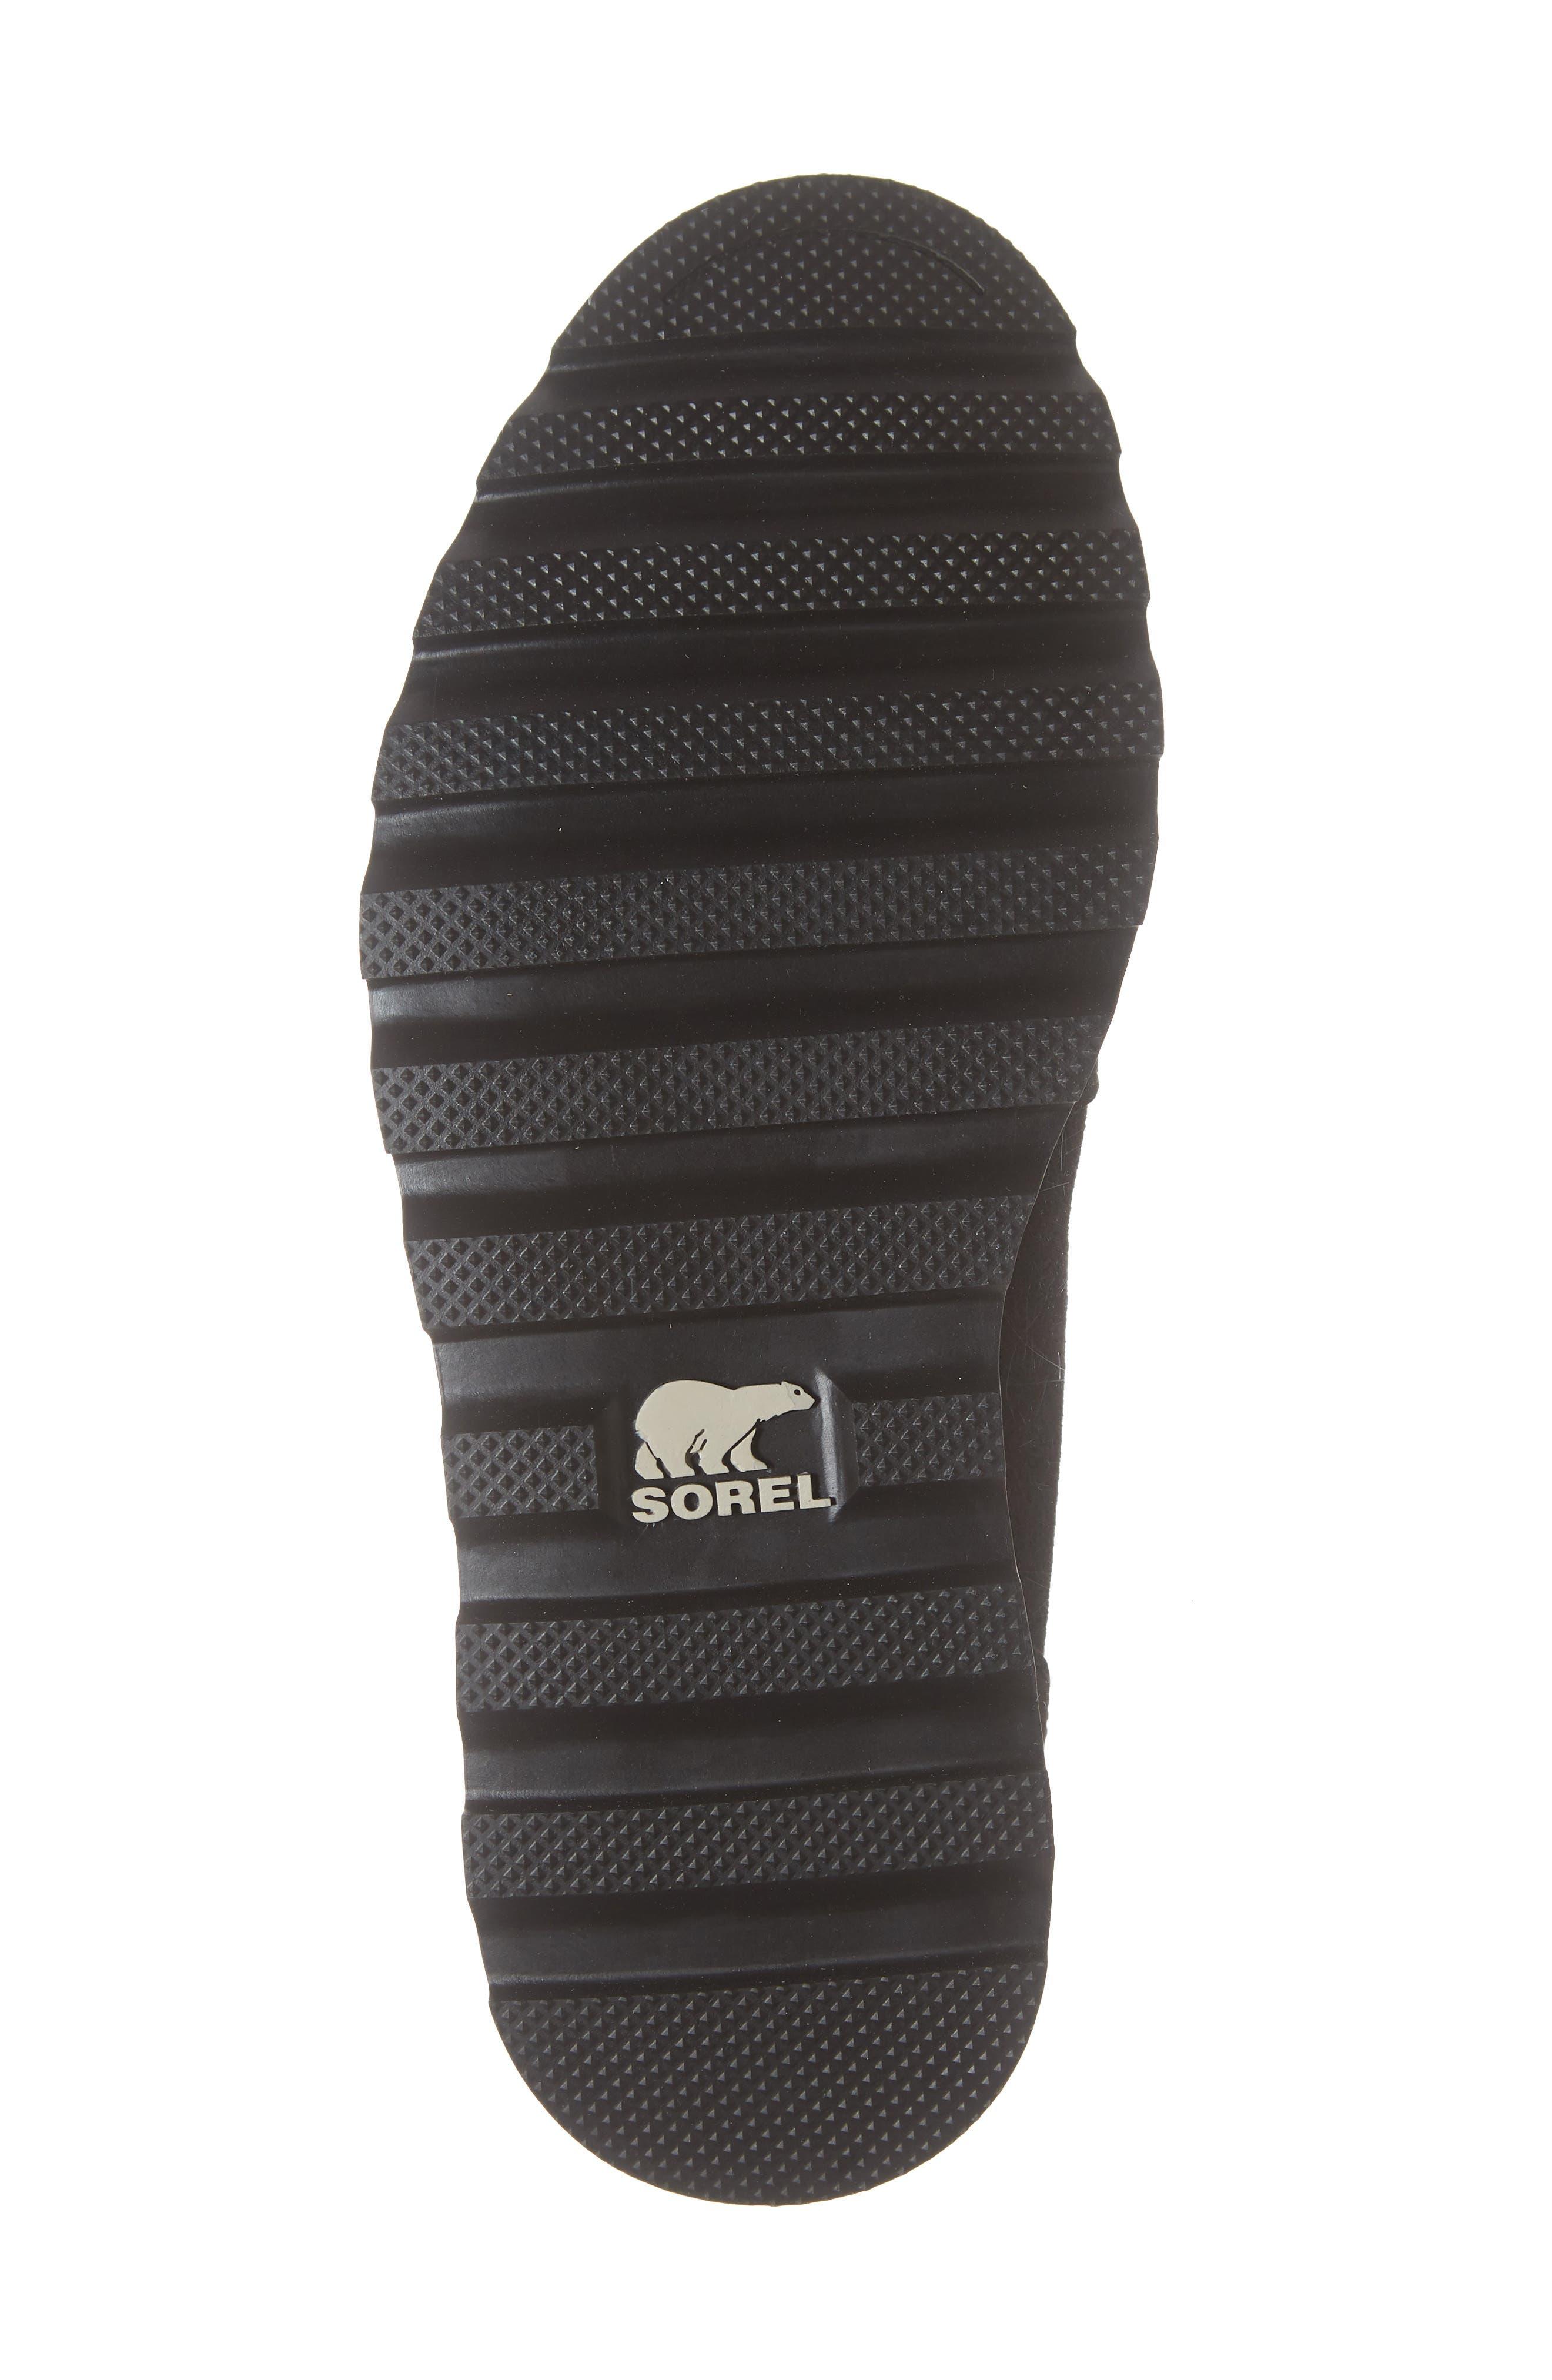 SOREL, Ainsley Conquest Waterproof Boot, Alternate thumbnail 6, color, BLACK/ BLACK